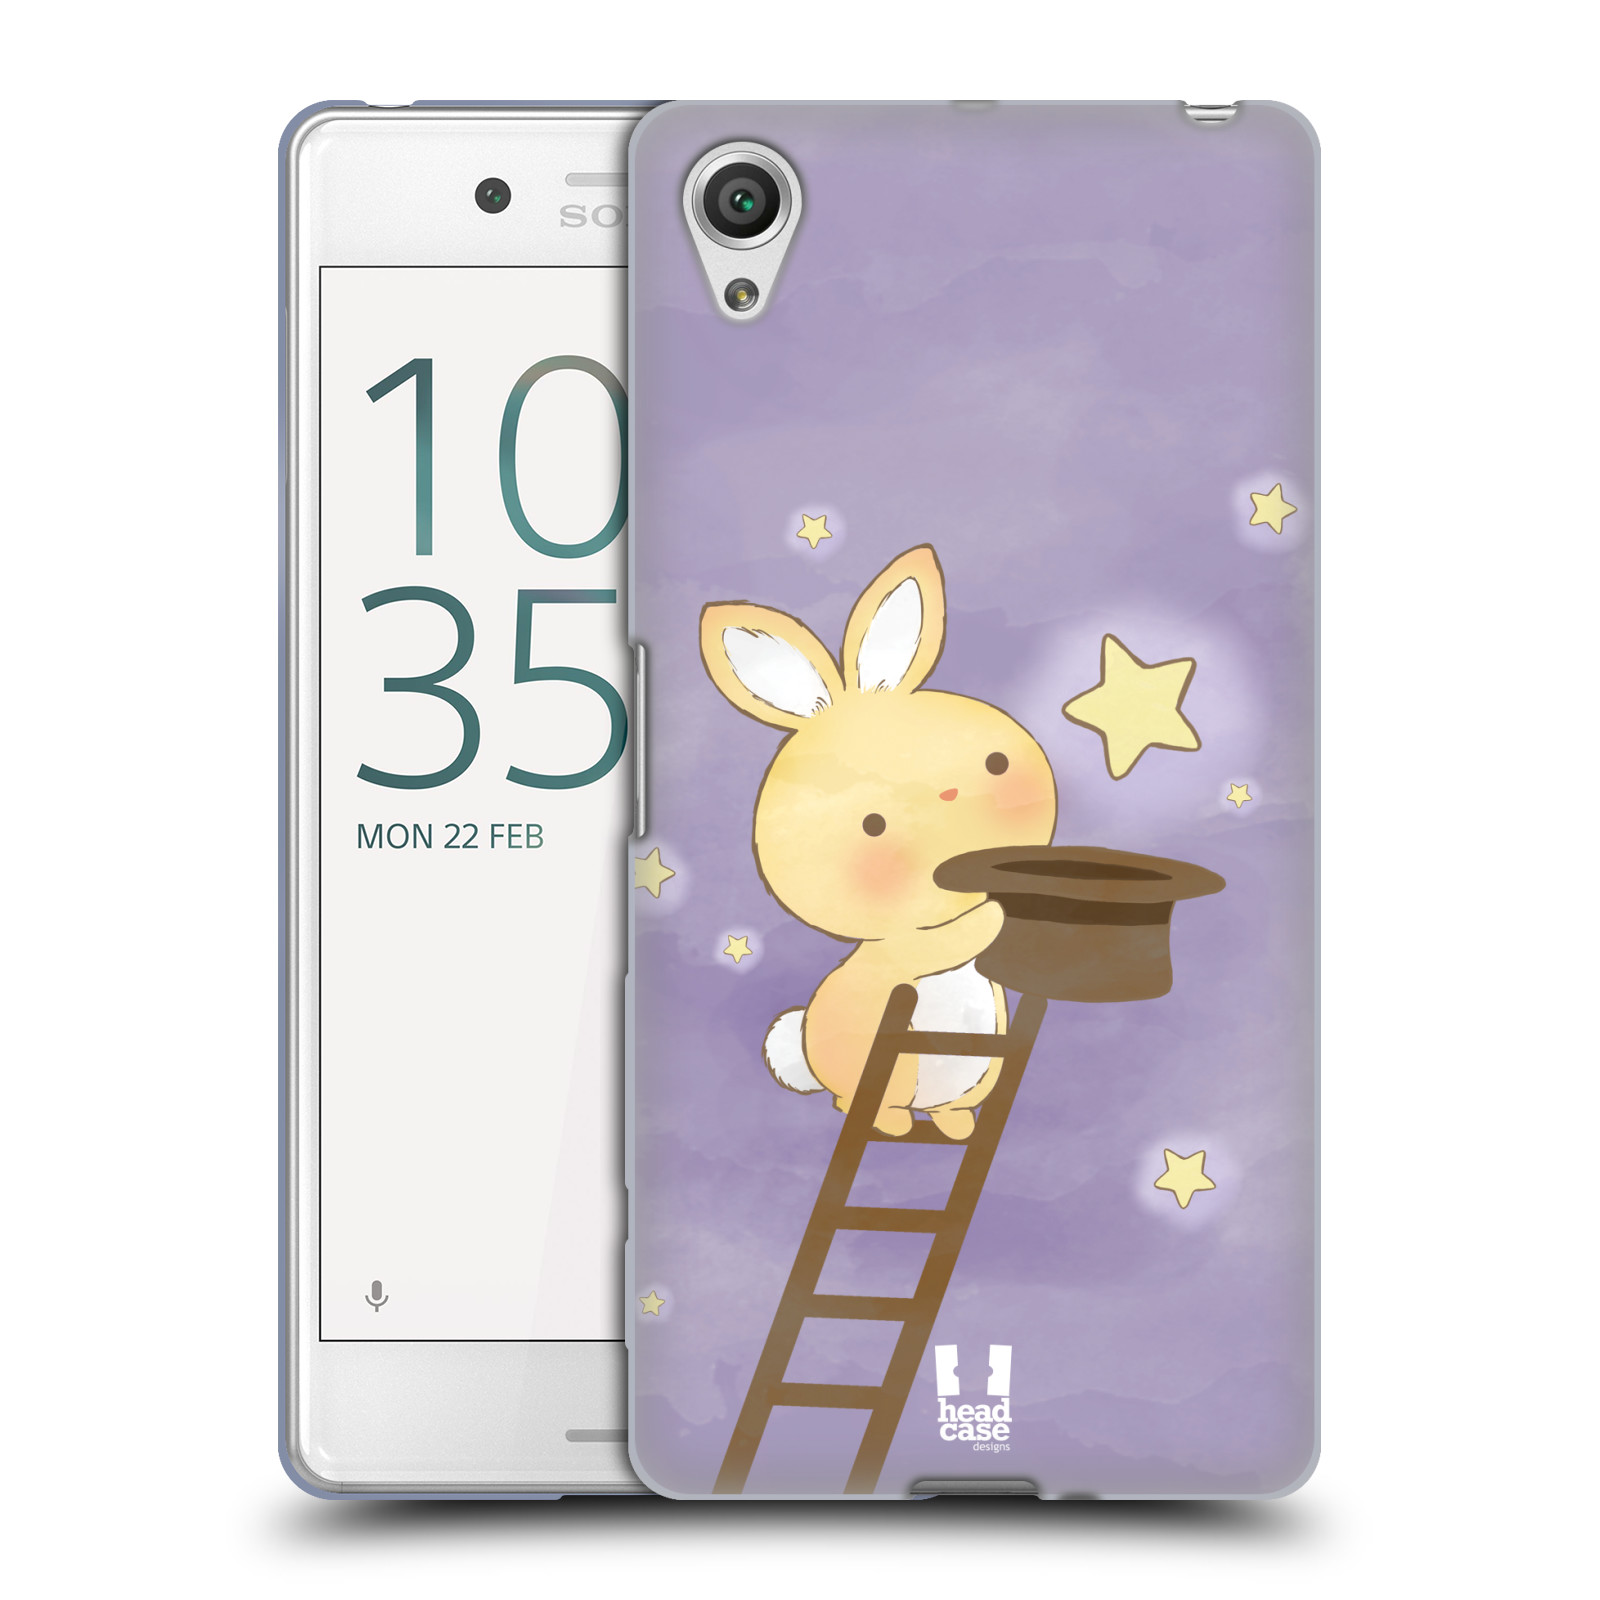 HEAD CASE silikonový obal na mobil Sony Xperia X PERFORMANCE (F8131, F8132) vzor králíček a hvězdy fialová